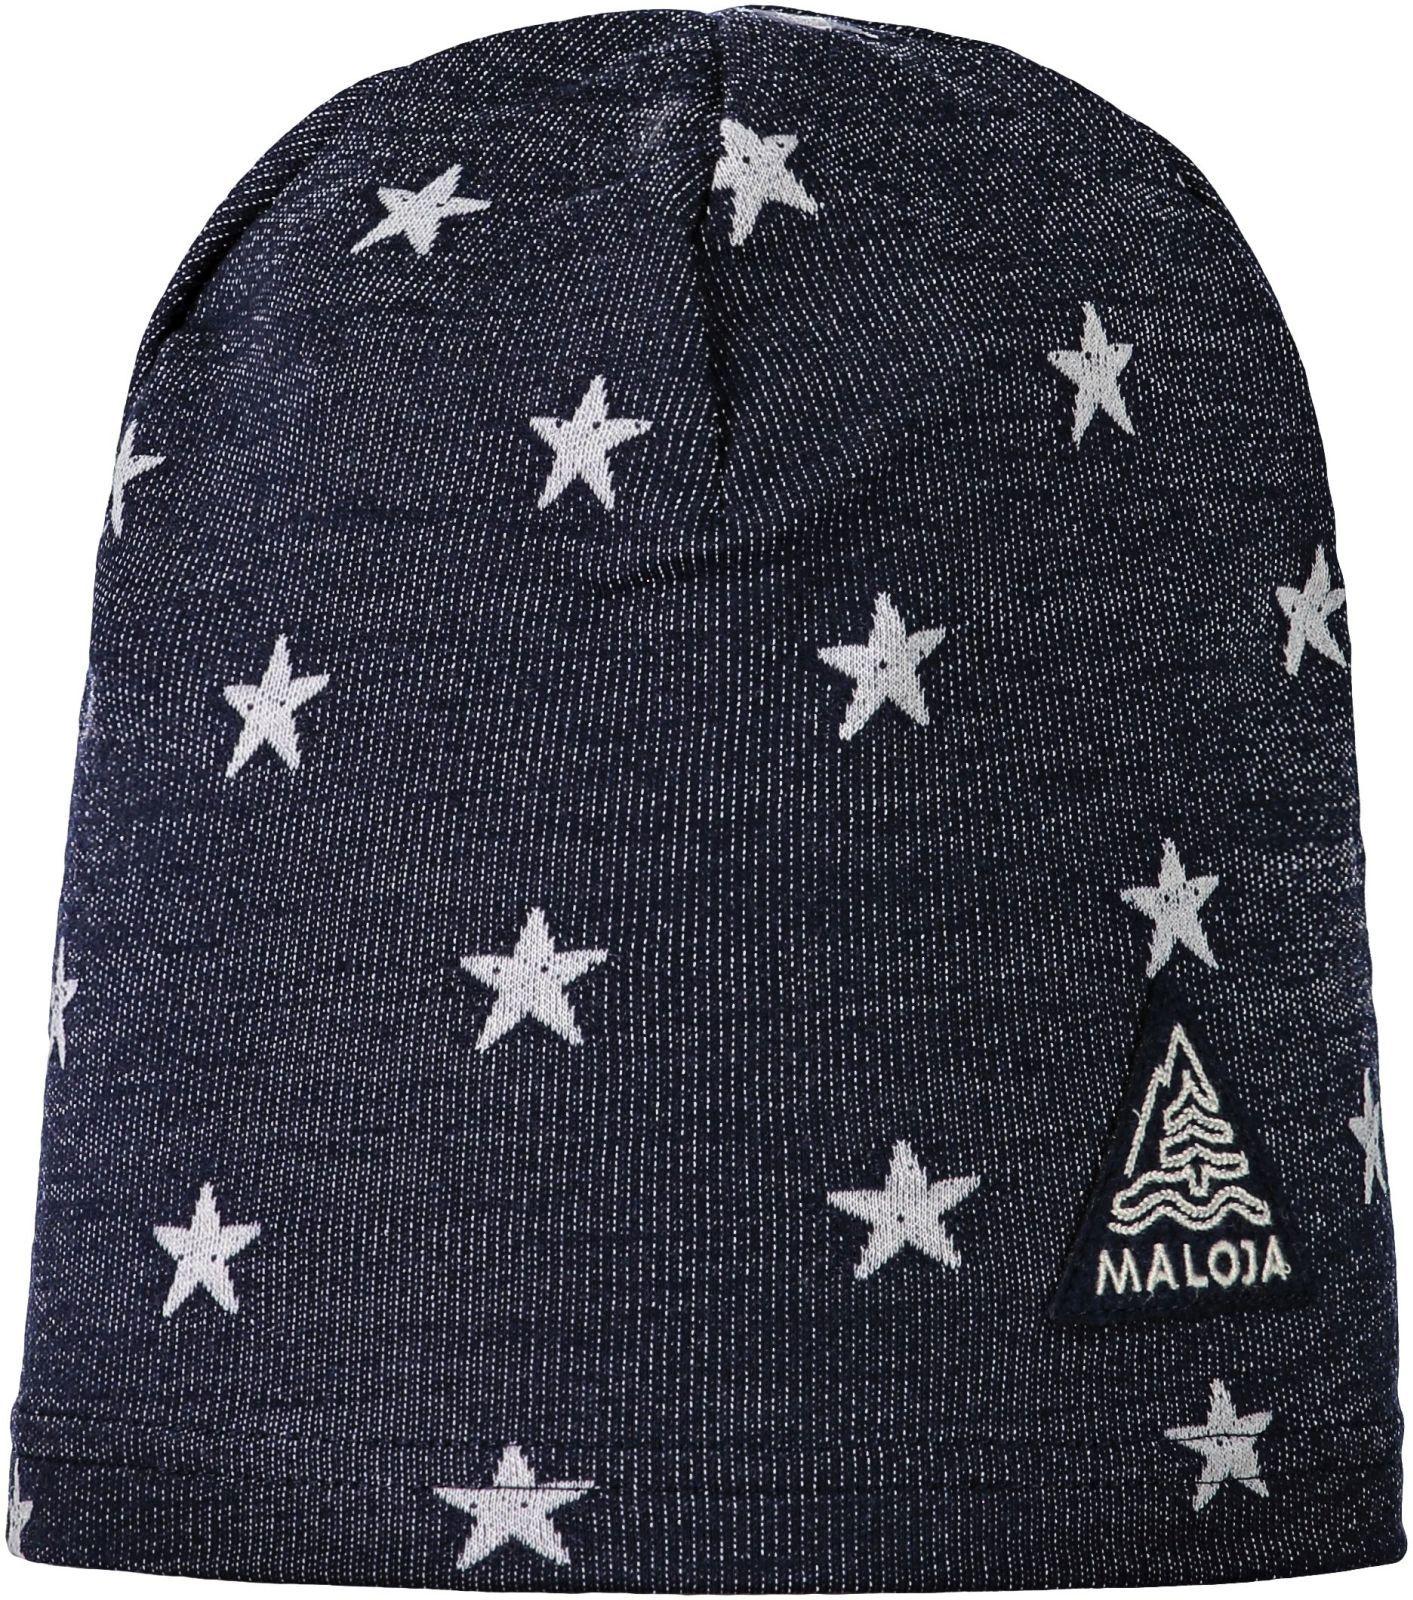 Maloja AndeerM - mountain lake stars uni